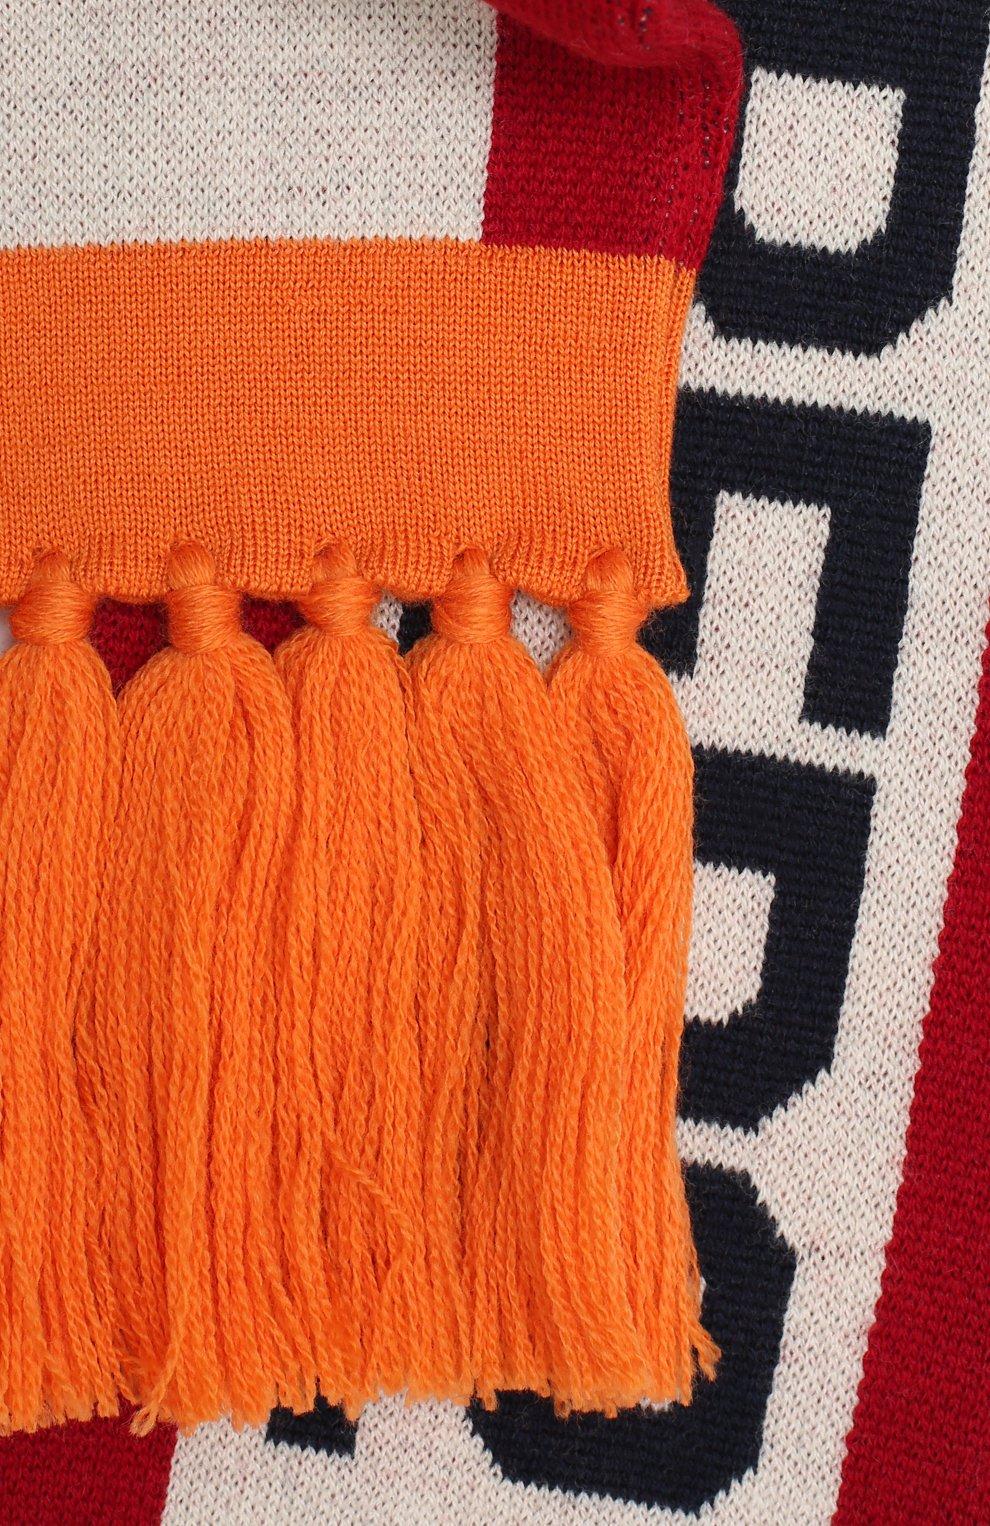 Мужской шерстяной шарф DSQUARED2 разноцветного цвета, арт. KNM0046 01WJ0387 | Фото 2